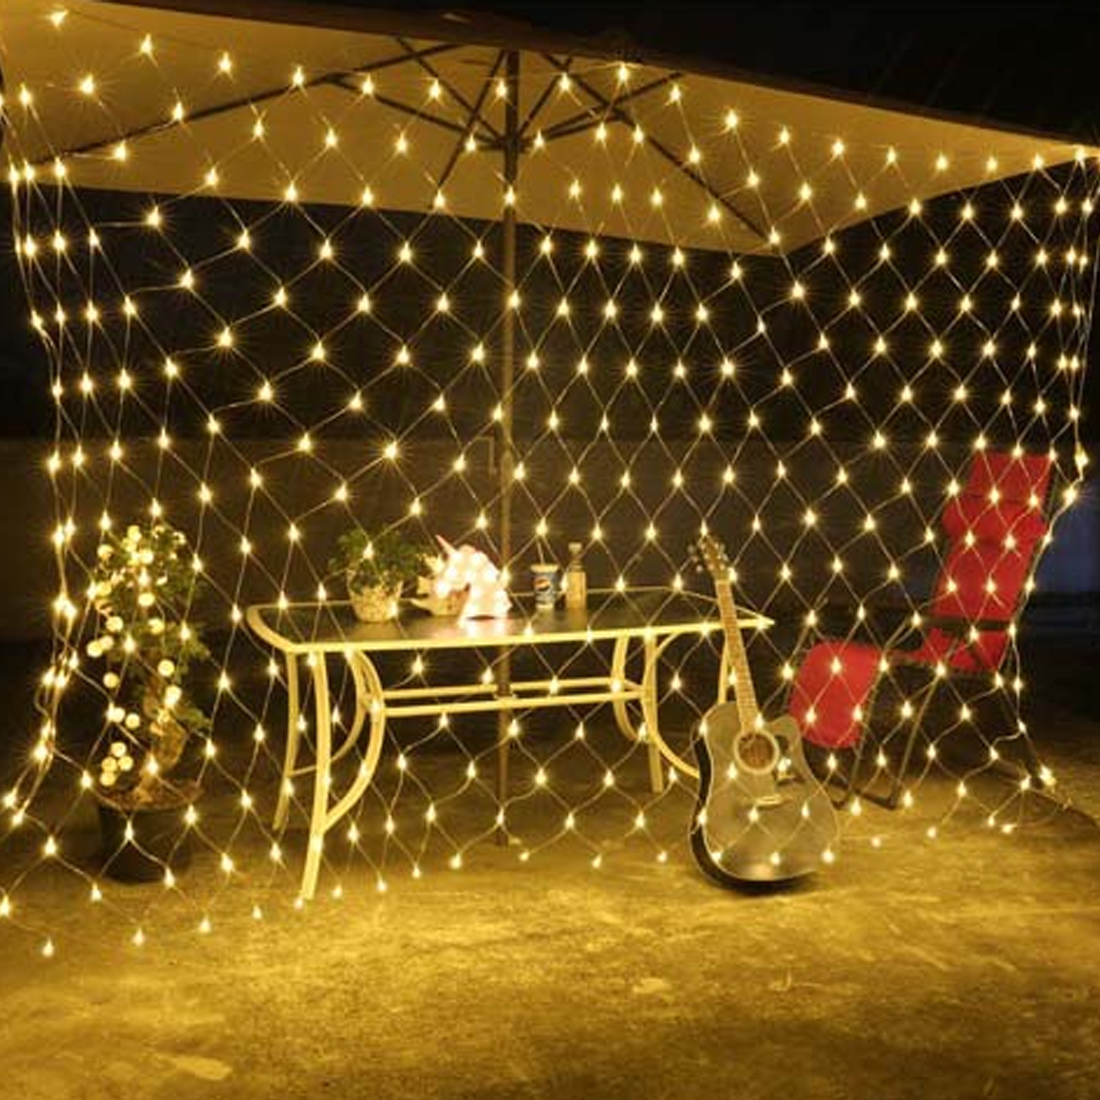 Net Mesh Fairy String Light 1pc 320 LED 3mX2m Christmas Wedding Party Fairy String Light with 8 Function Controller EU PlugNet Mesh Fairy String Light 1pc 320 LED 3mX2m Christmas Wedding Party Fairy String Light with 8 Function Controller EU Plug